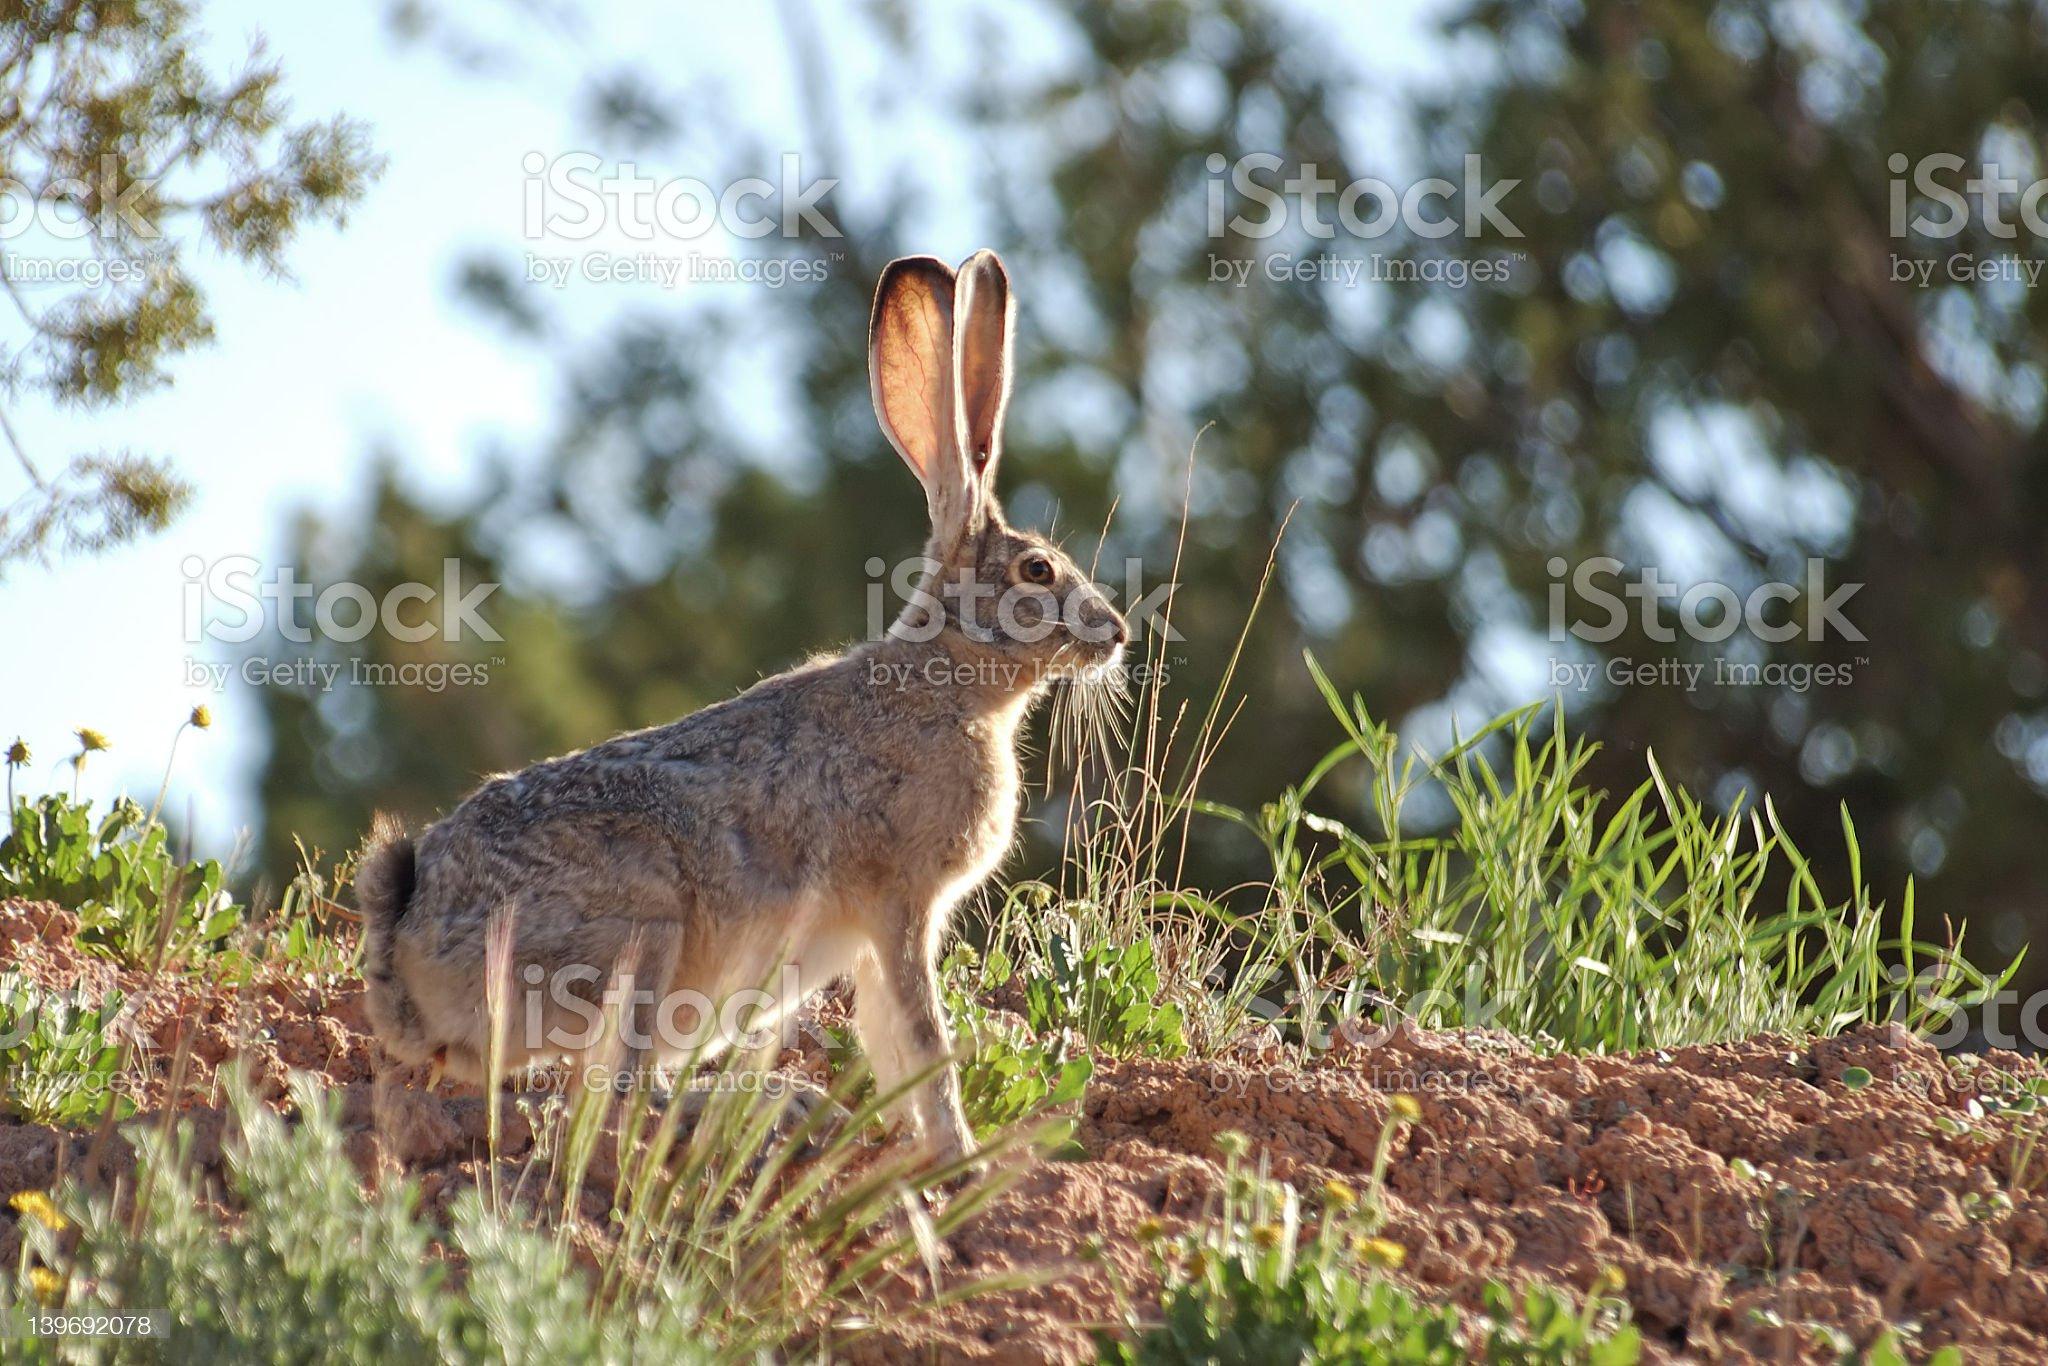 Jackrabbit with his eyes raised alert to danger royalty-free stock photo